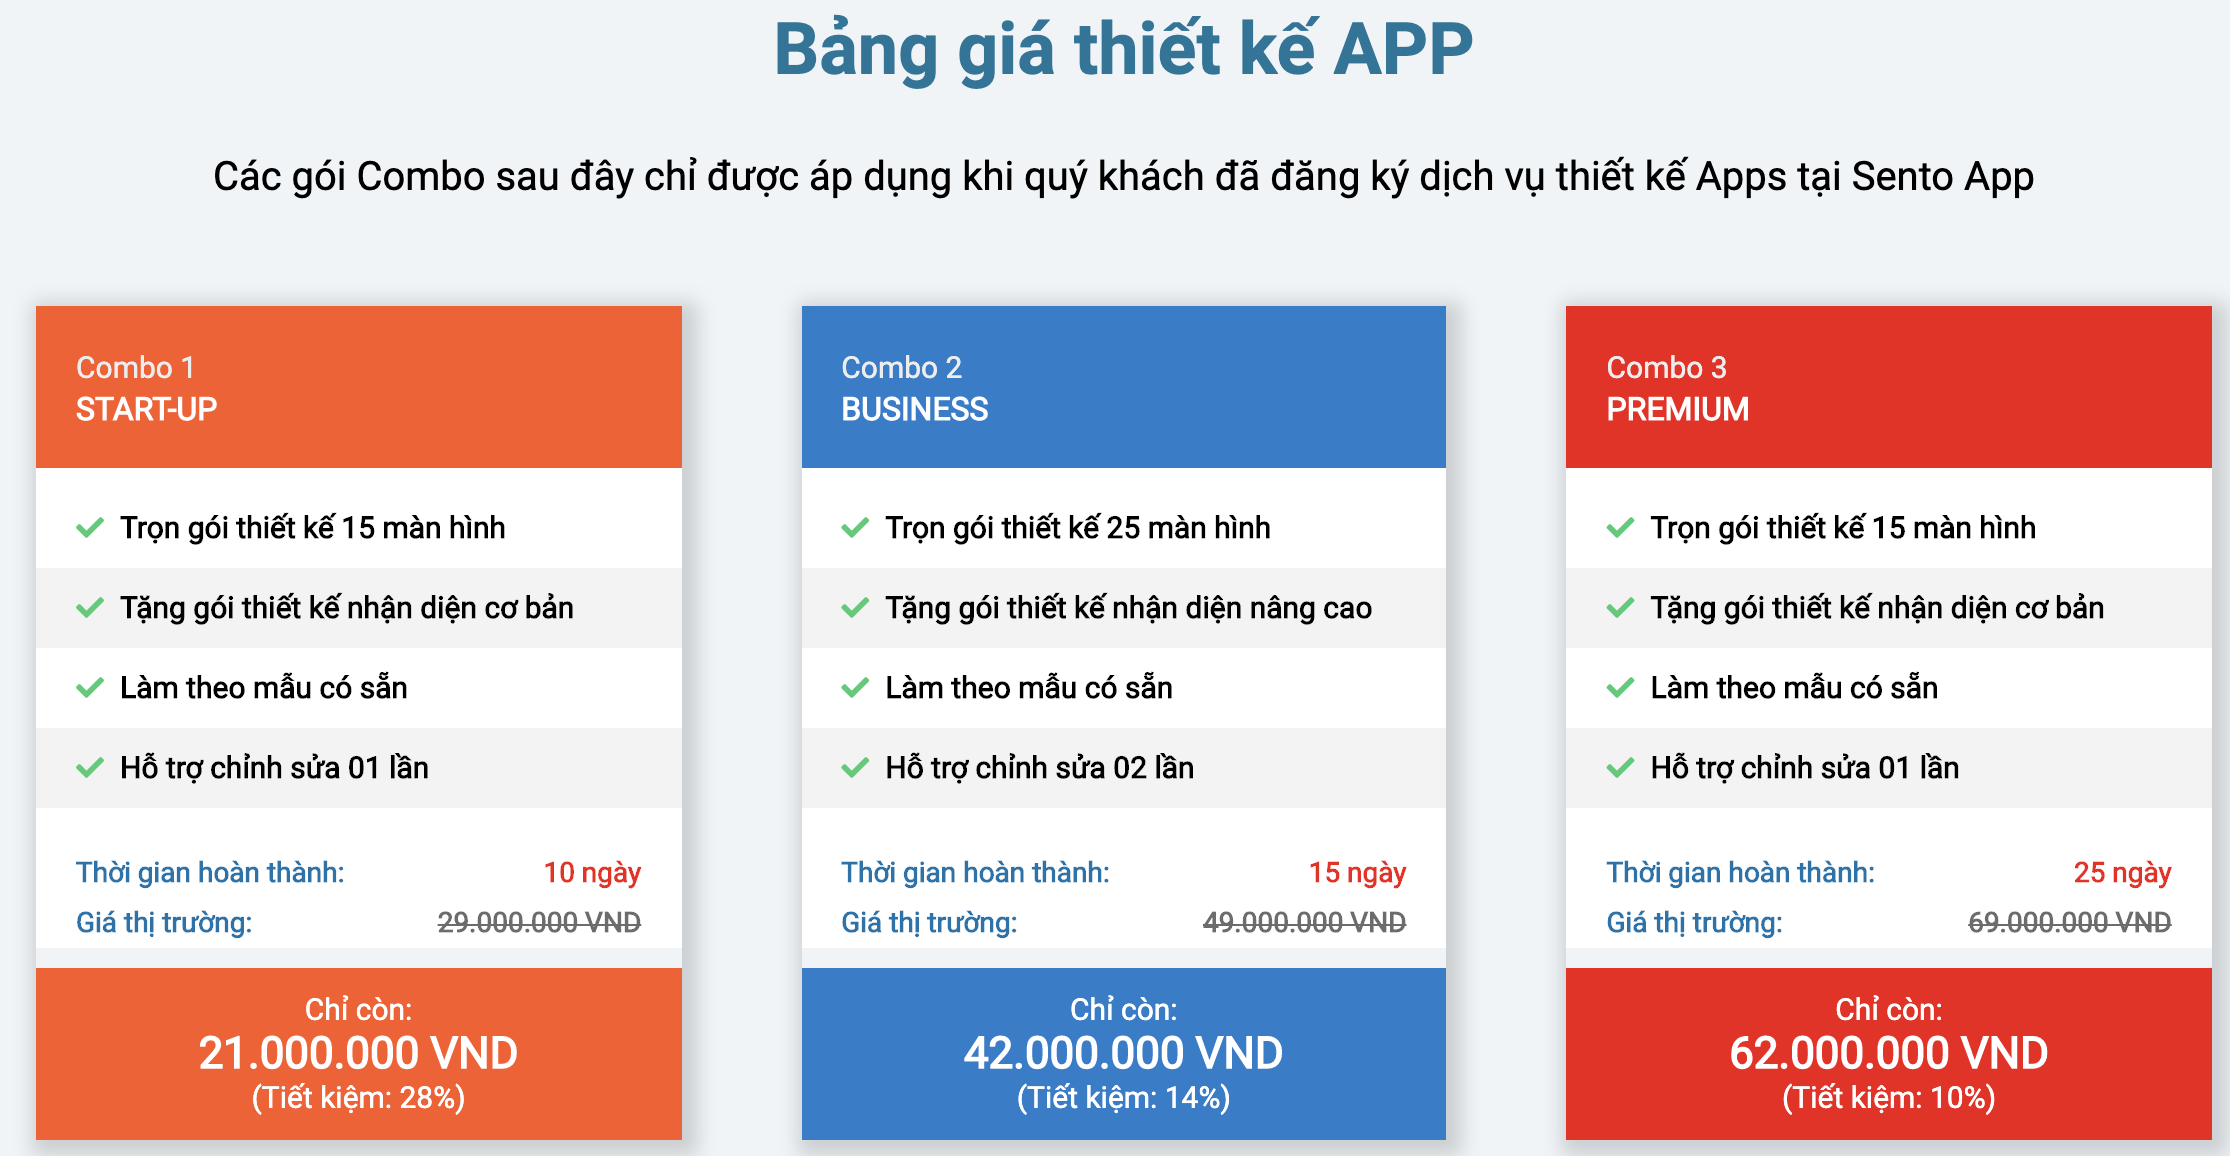 Bang-gia-thiet-ke-app-mobile